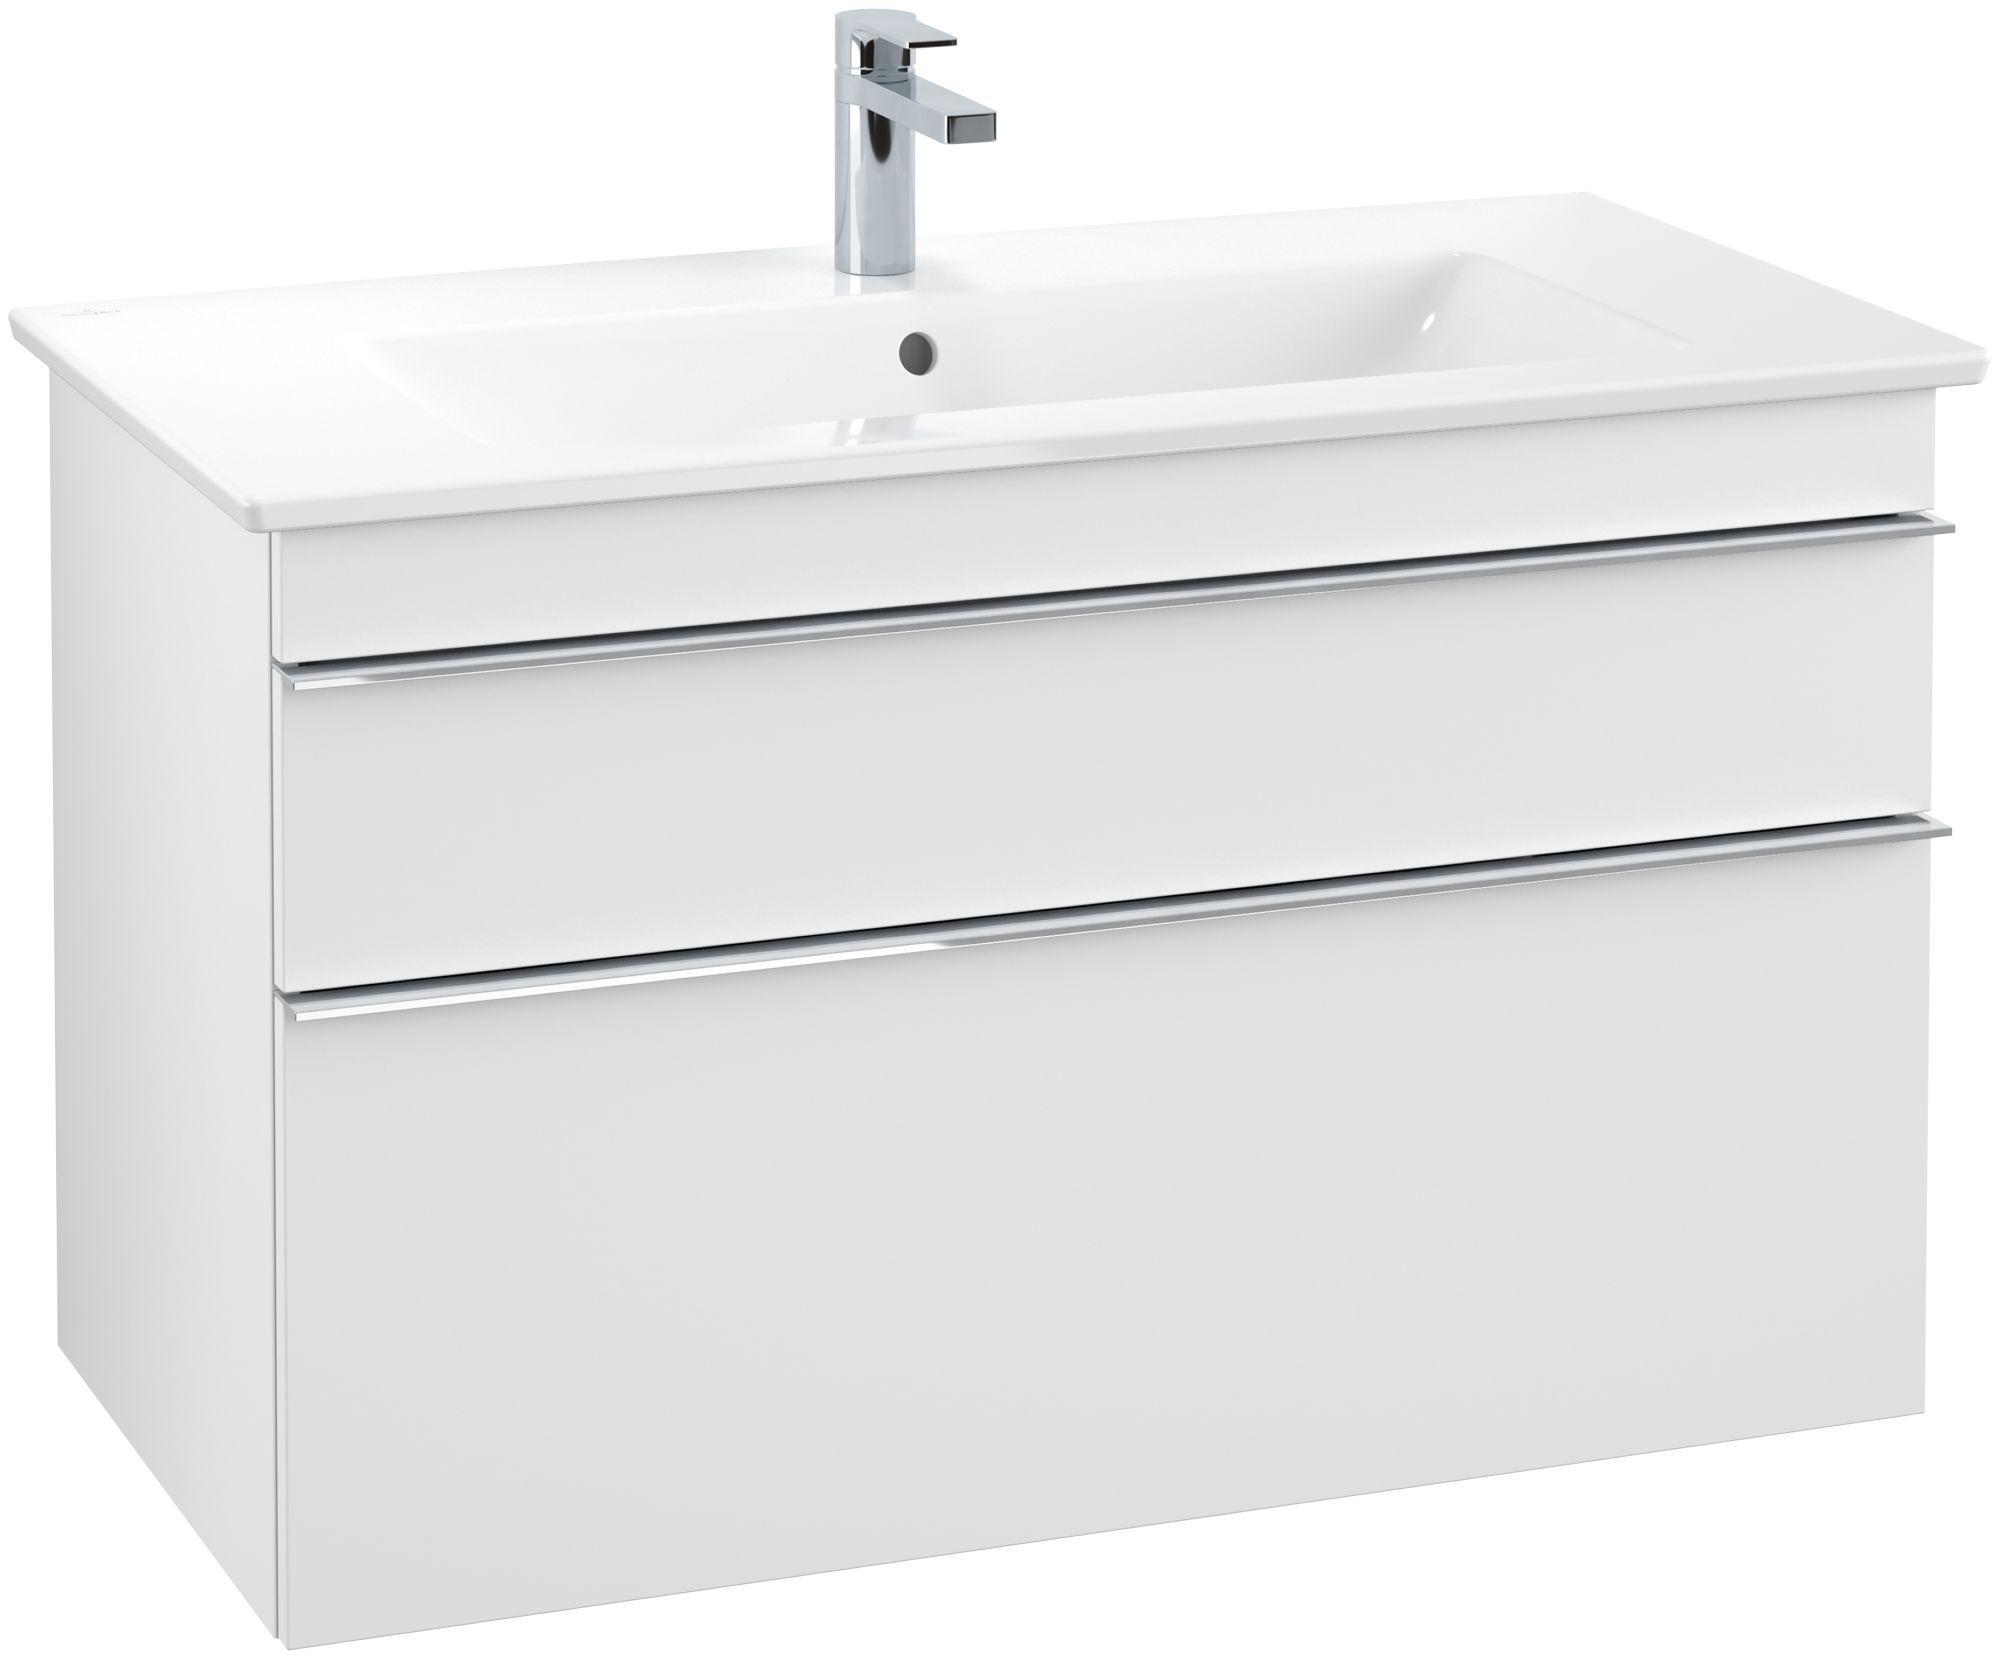 Villeroy & Boch Venticello Waschtischunterschrank 2 Auszüge B:953xT:502xH:590mm weiß matt Griffe chrom A92601MS